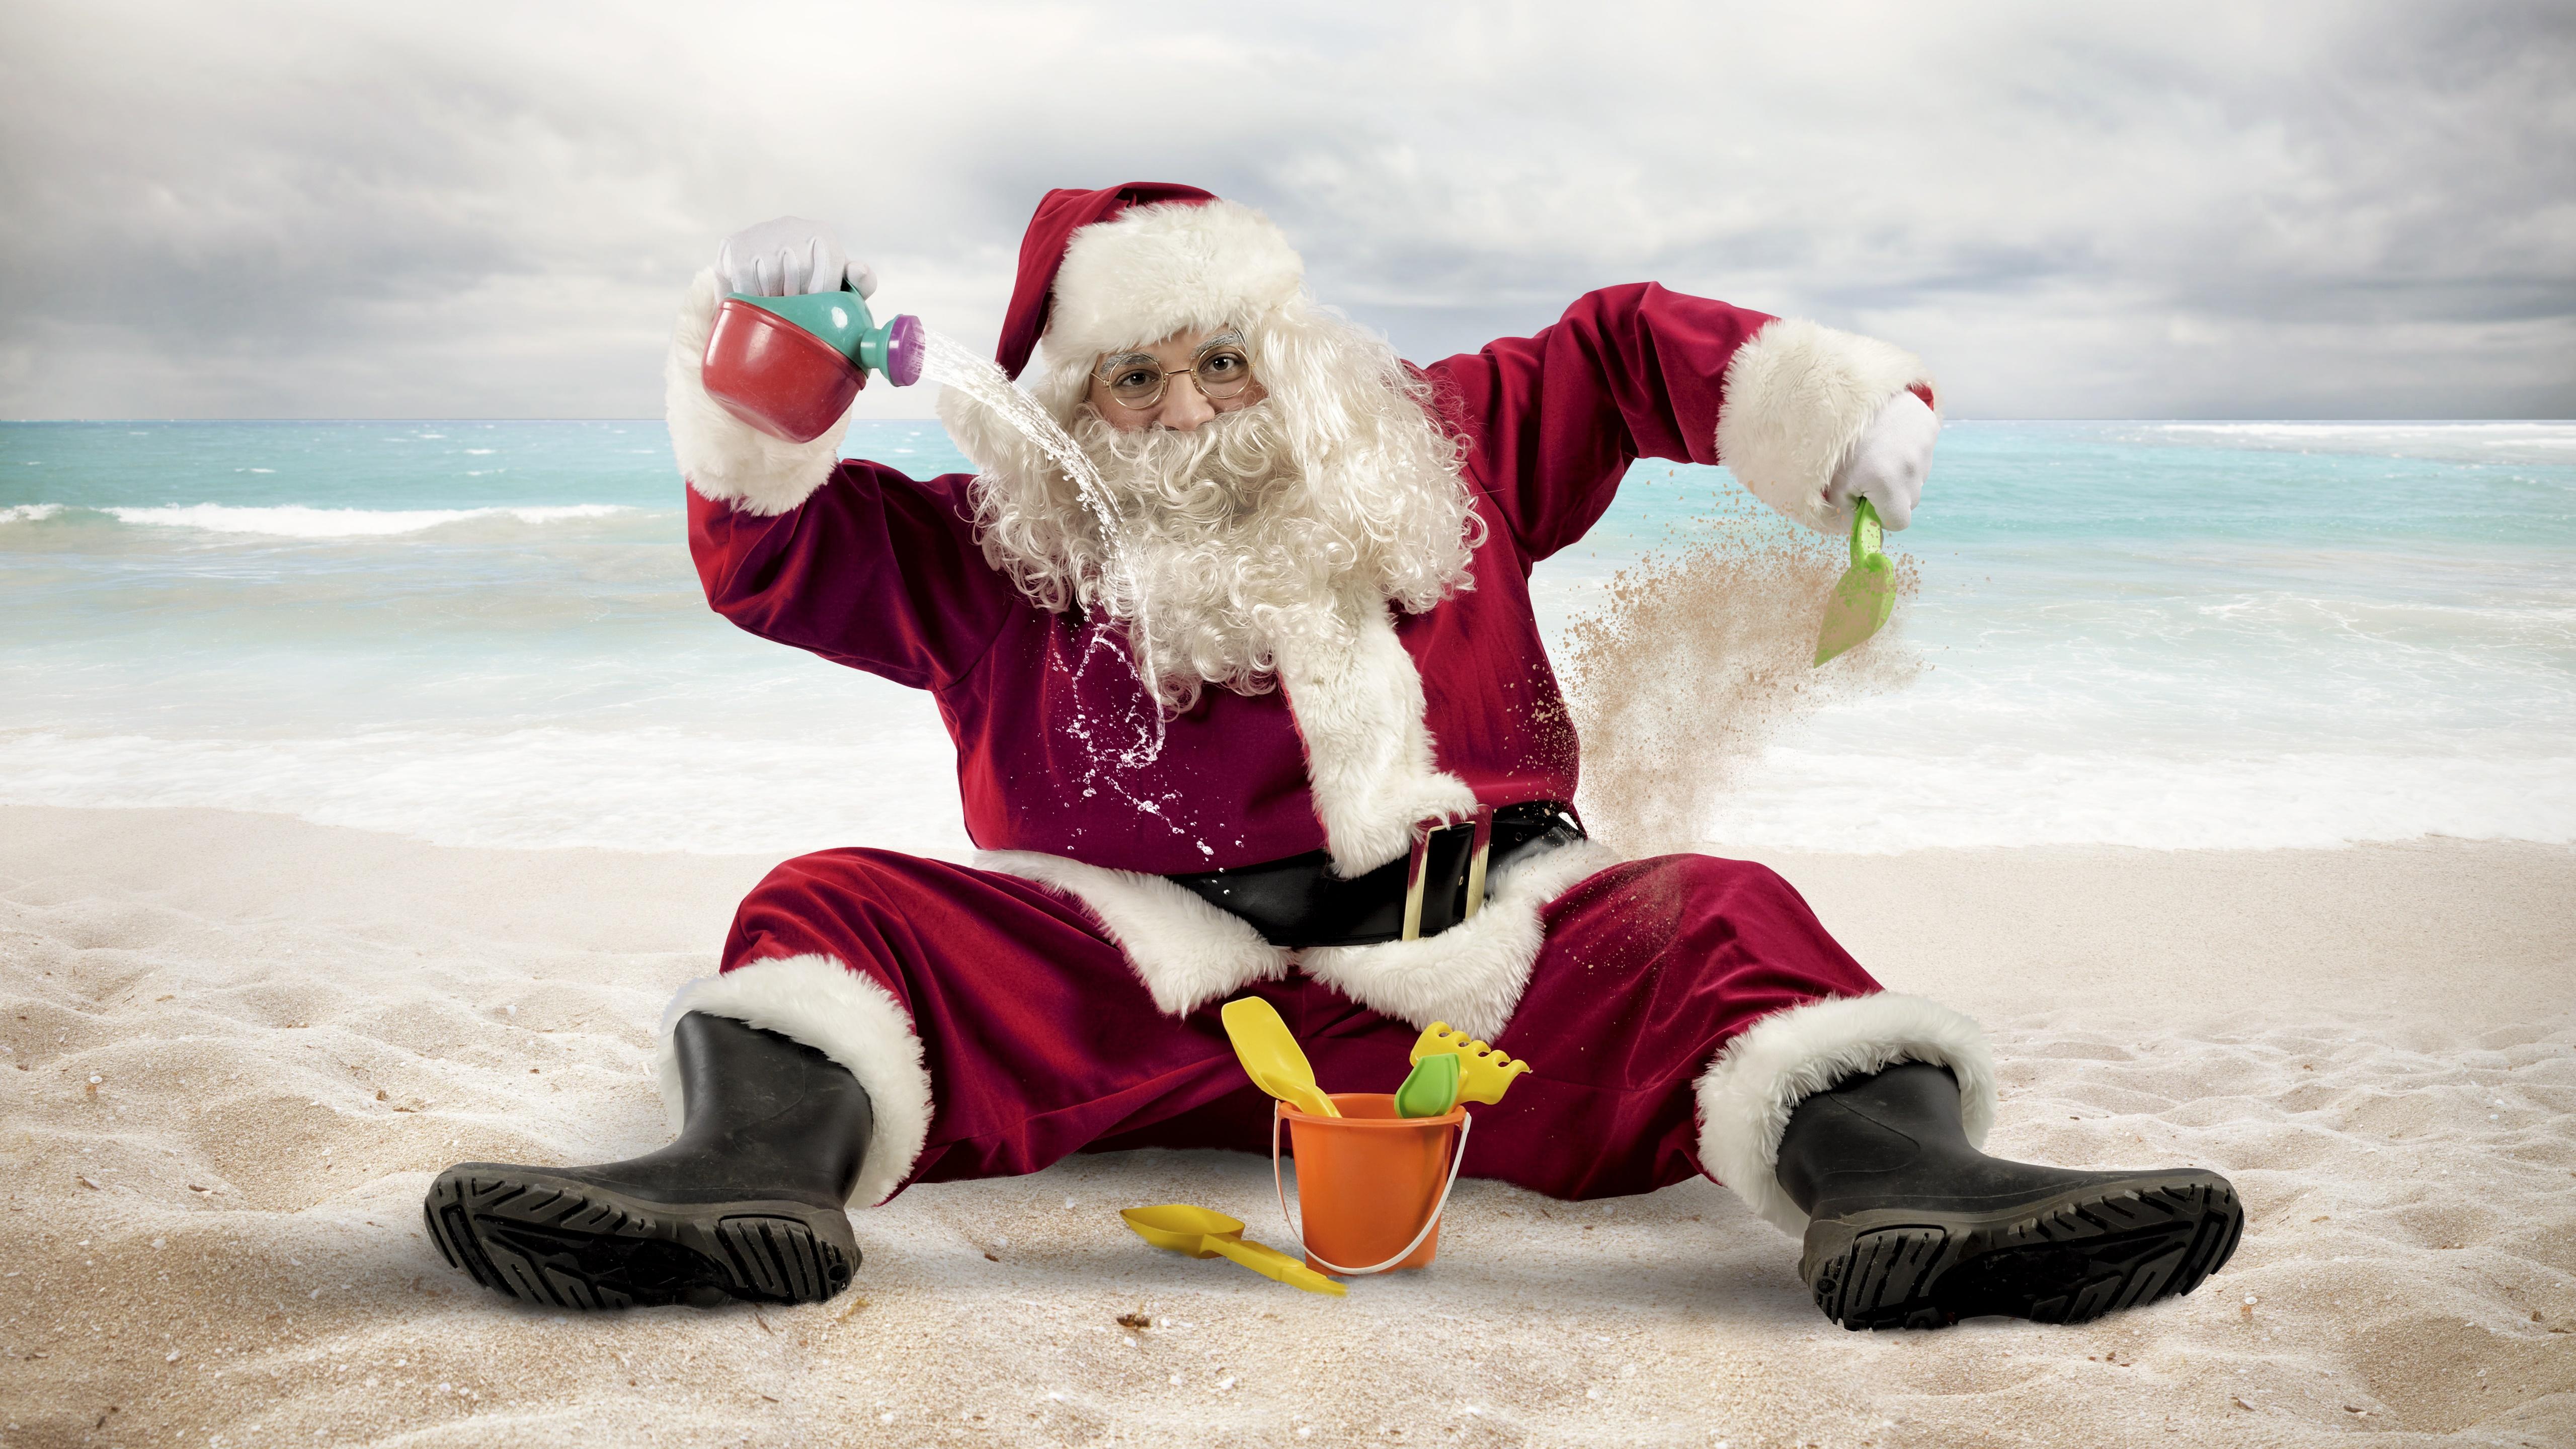 Funny Santa on the beach wallpaper